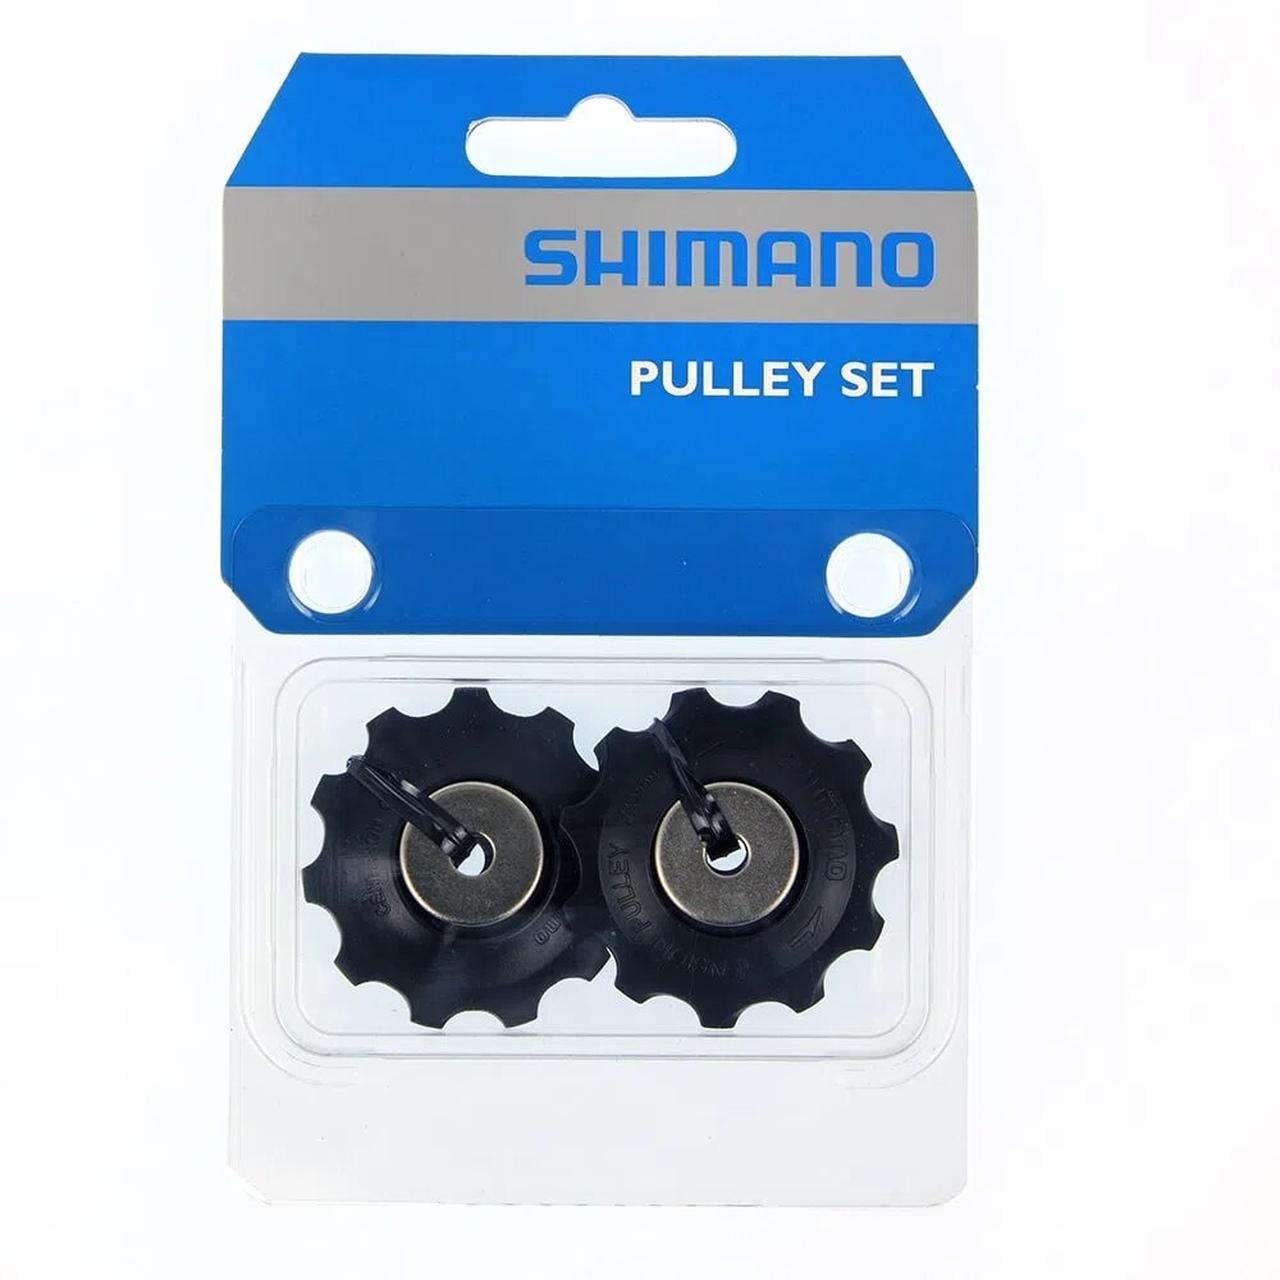 ROLDANA DE CAMBIO SHIMANO 105 RD-5700-M4000-M430-M300-M390-M370 (1260222)